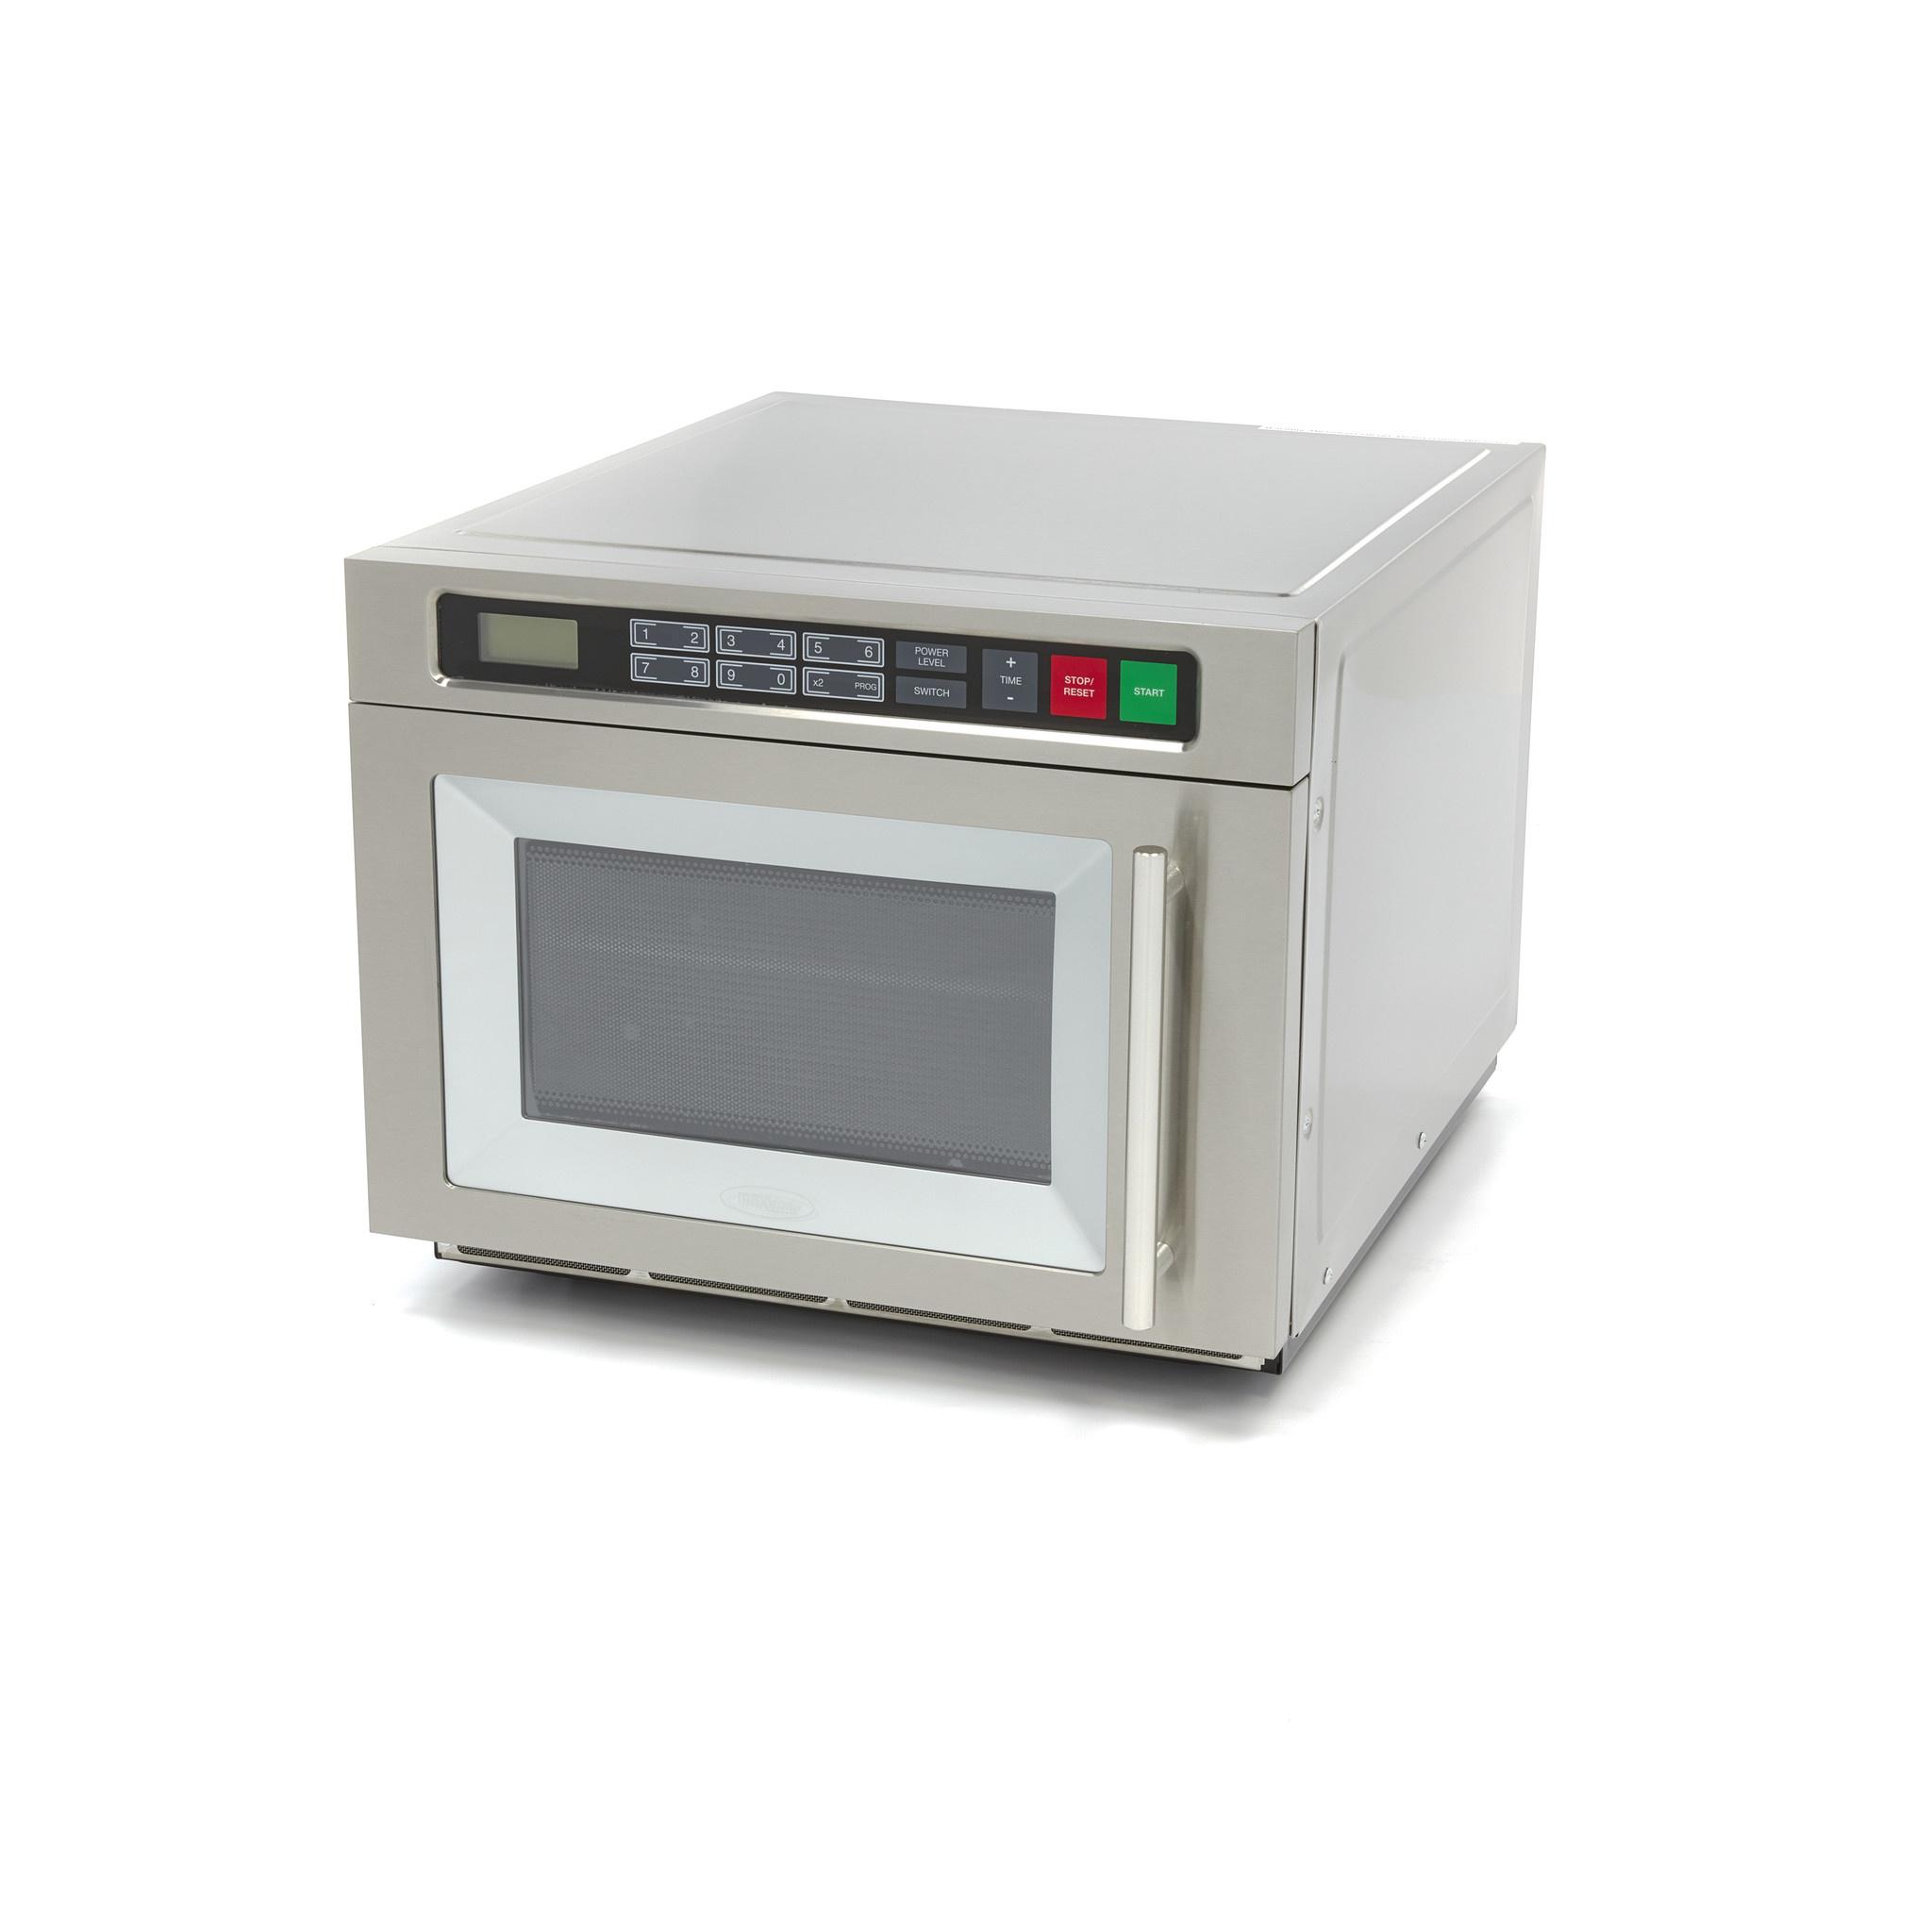 maxima-semi-professional-microwave-30l-1800w-progr